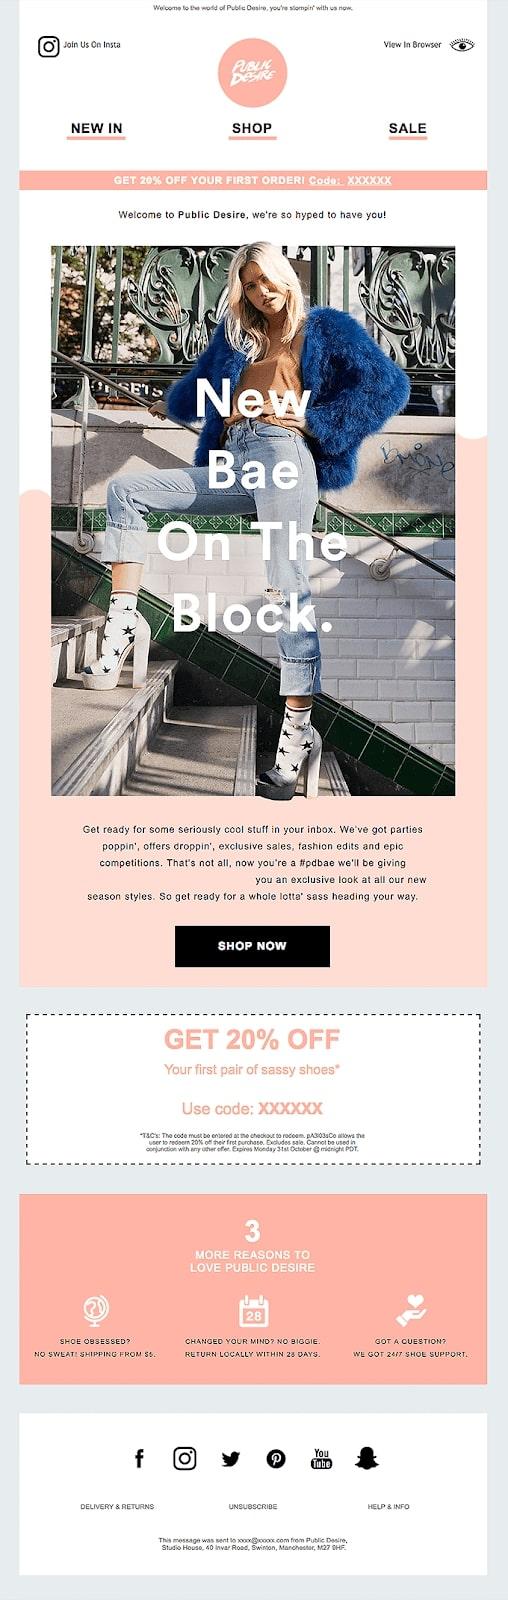 Public Desire promotional email